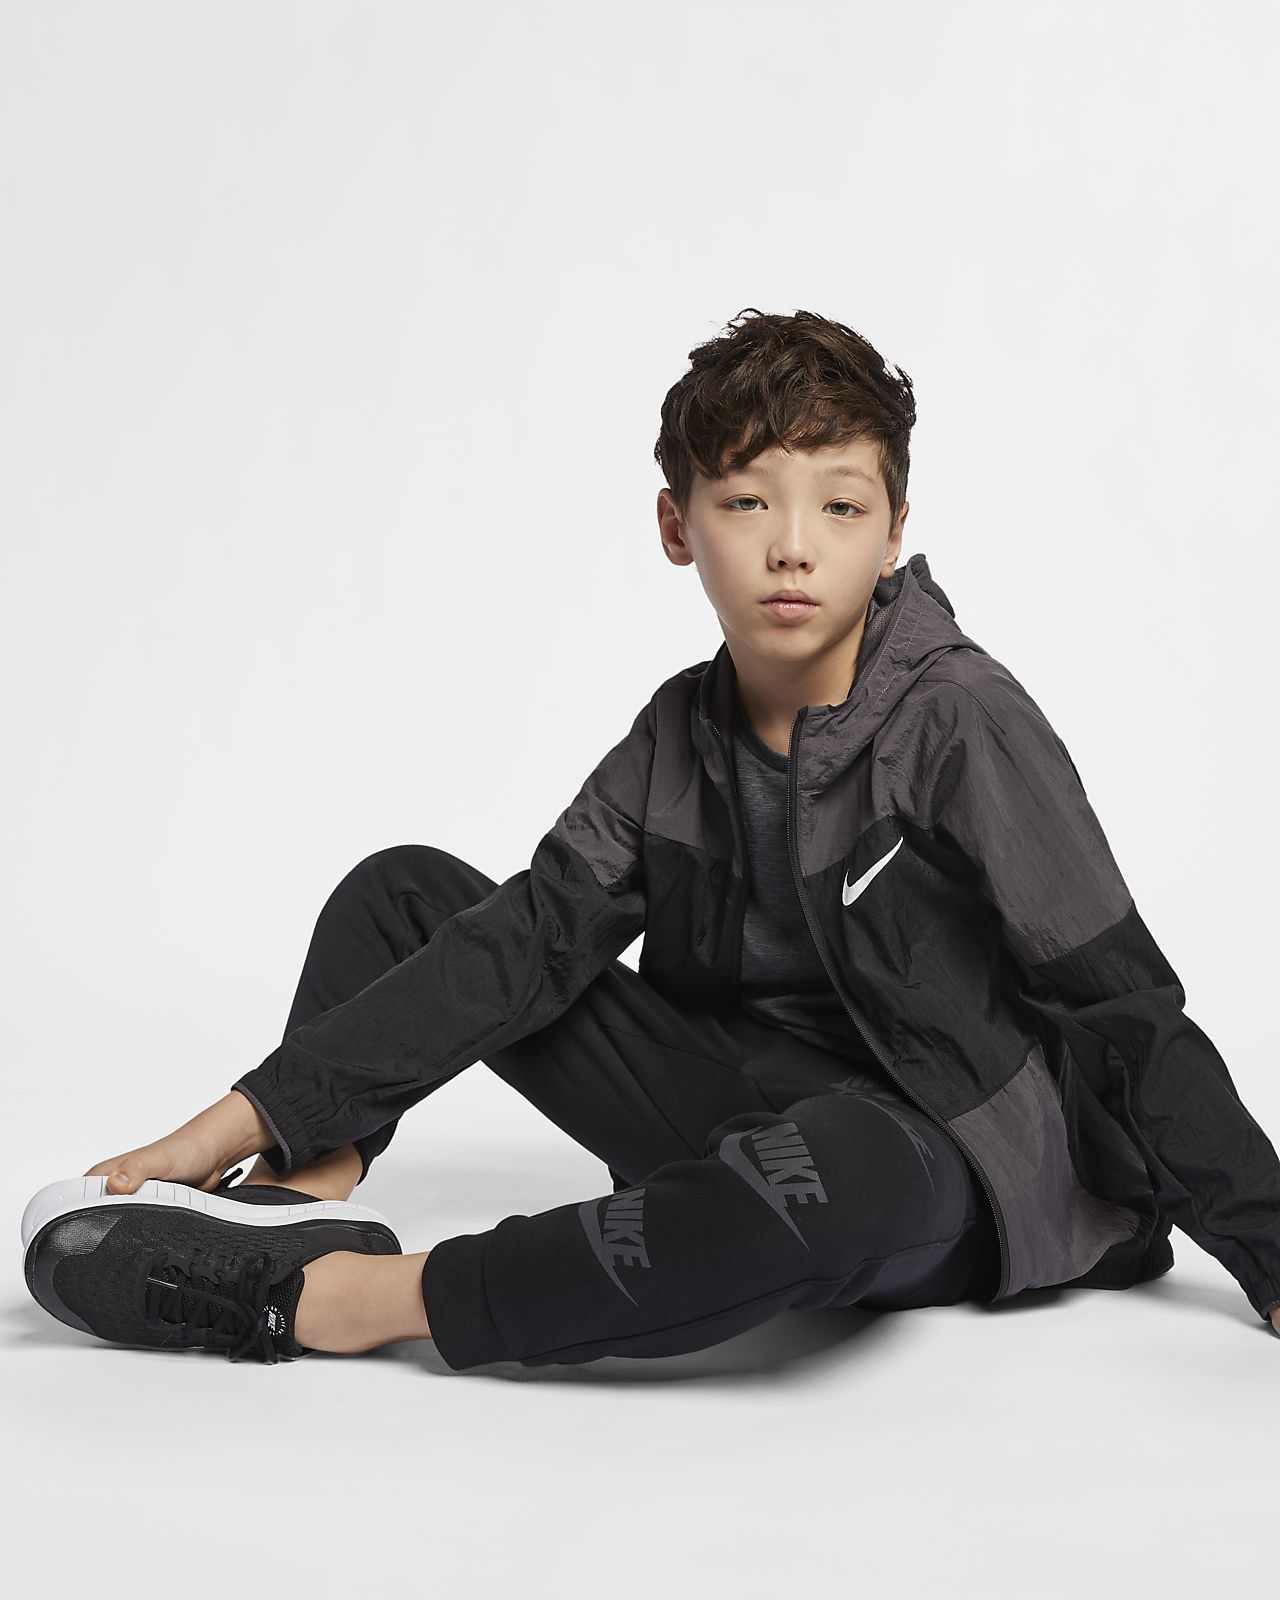 b2ec93014 Nike Dri-FIT Older Kids' Woven Training Jacket. Nike.com CA